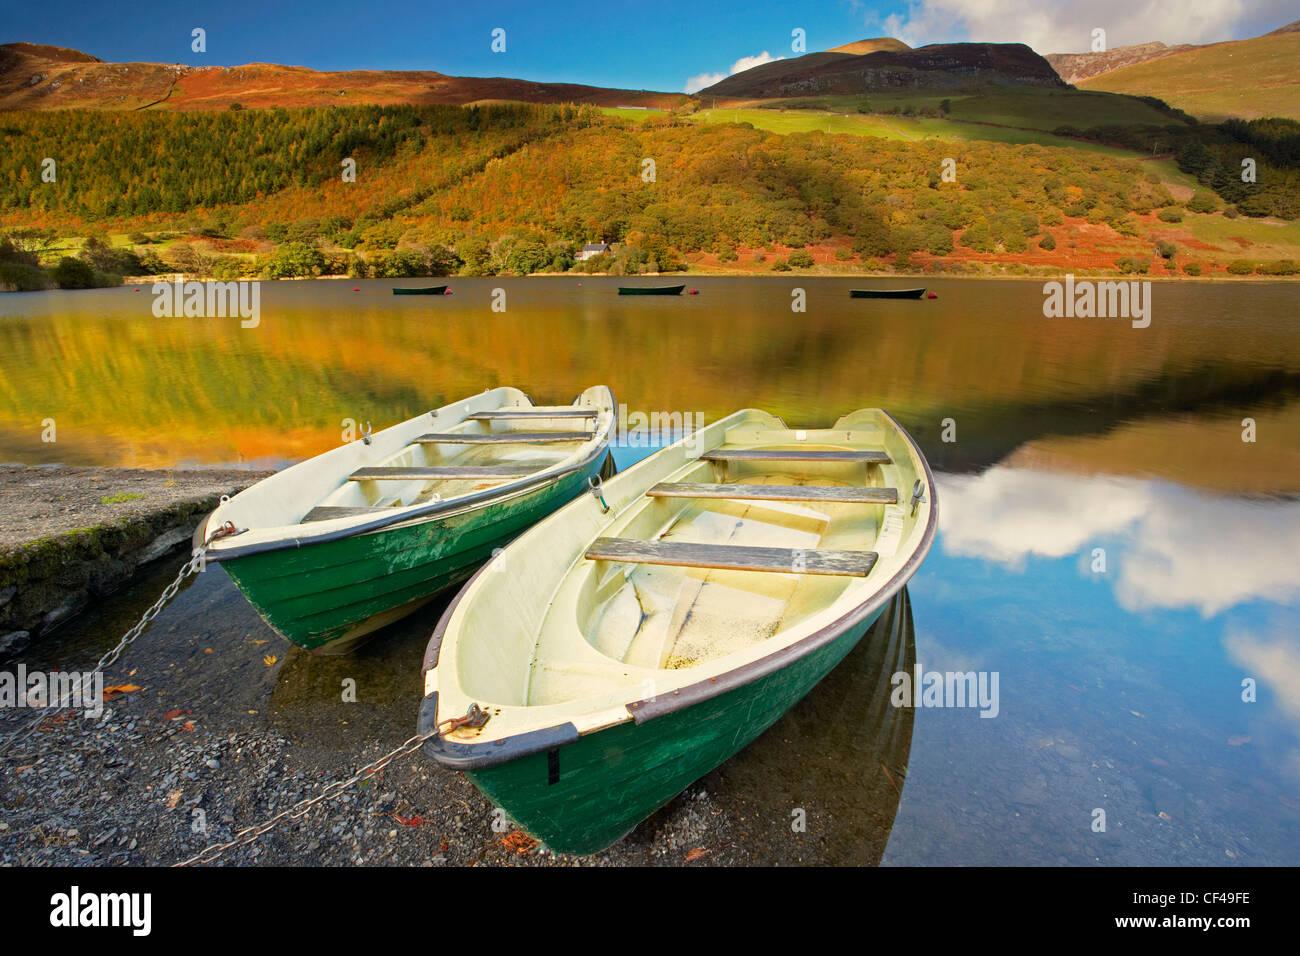 Barche da pesca in tal Y Llyn lake in Snowdonia. Foto Stock